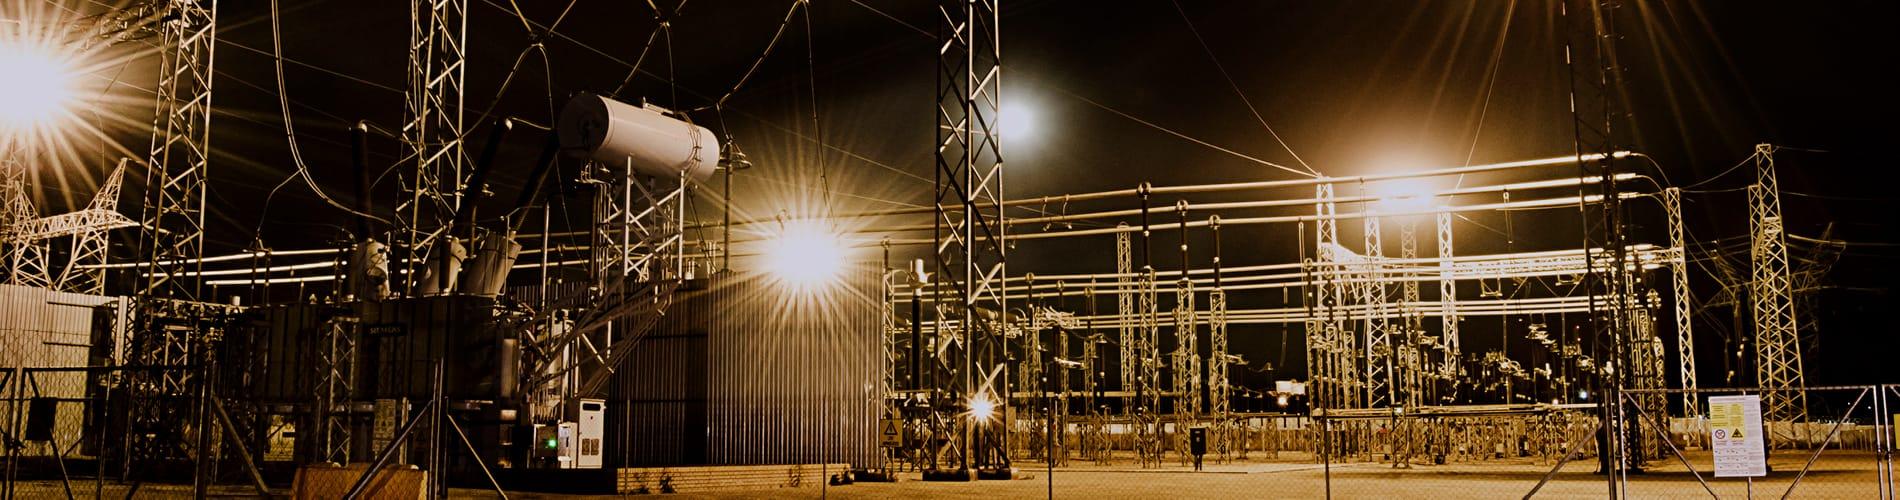 GenLux Lighting Eskom Station Lights